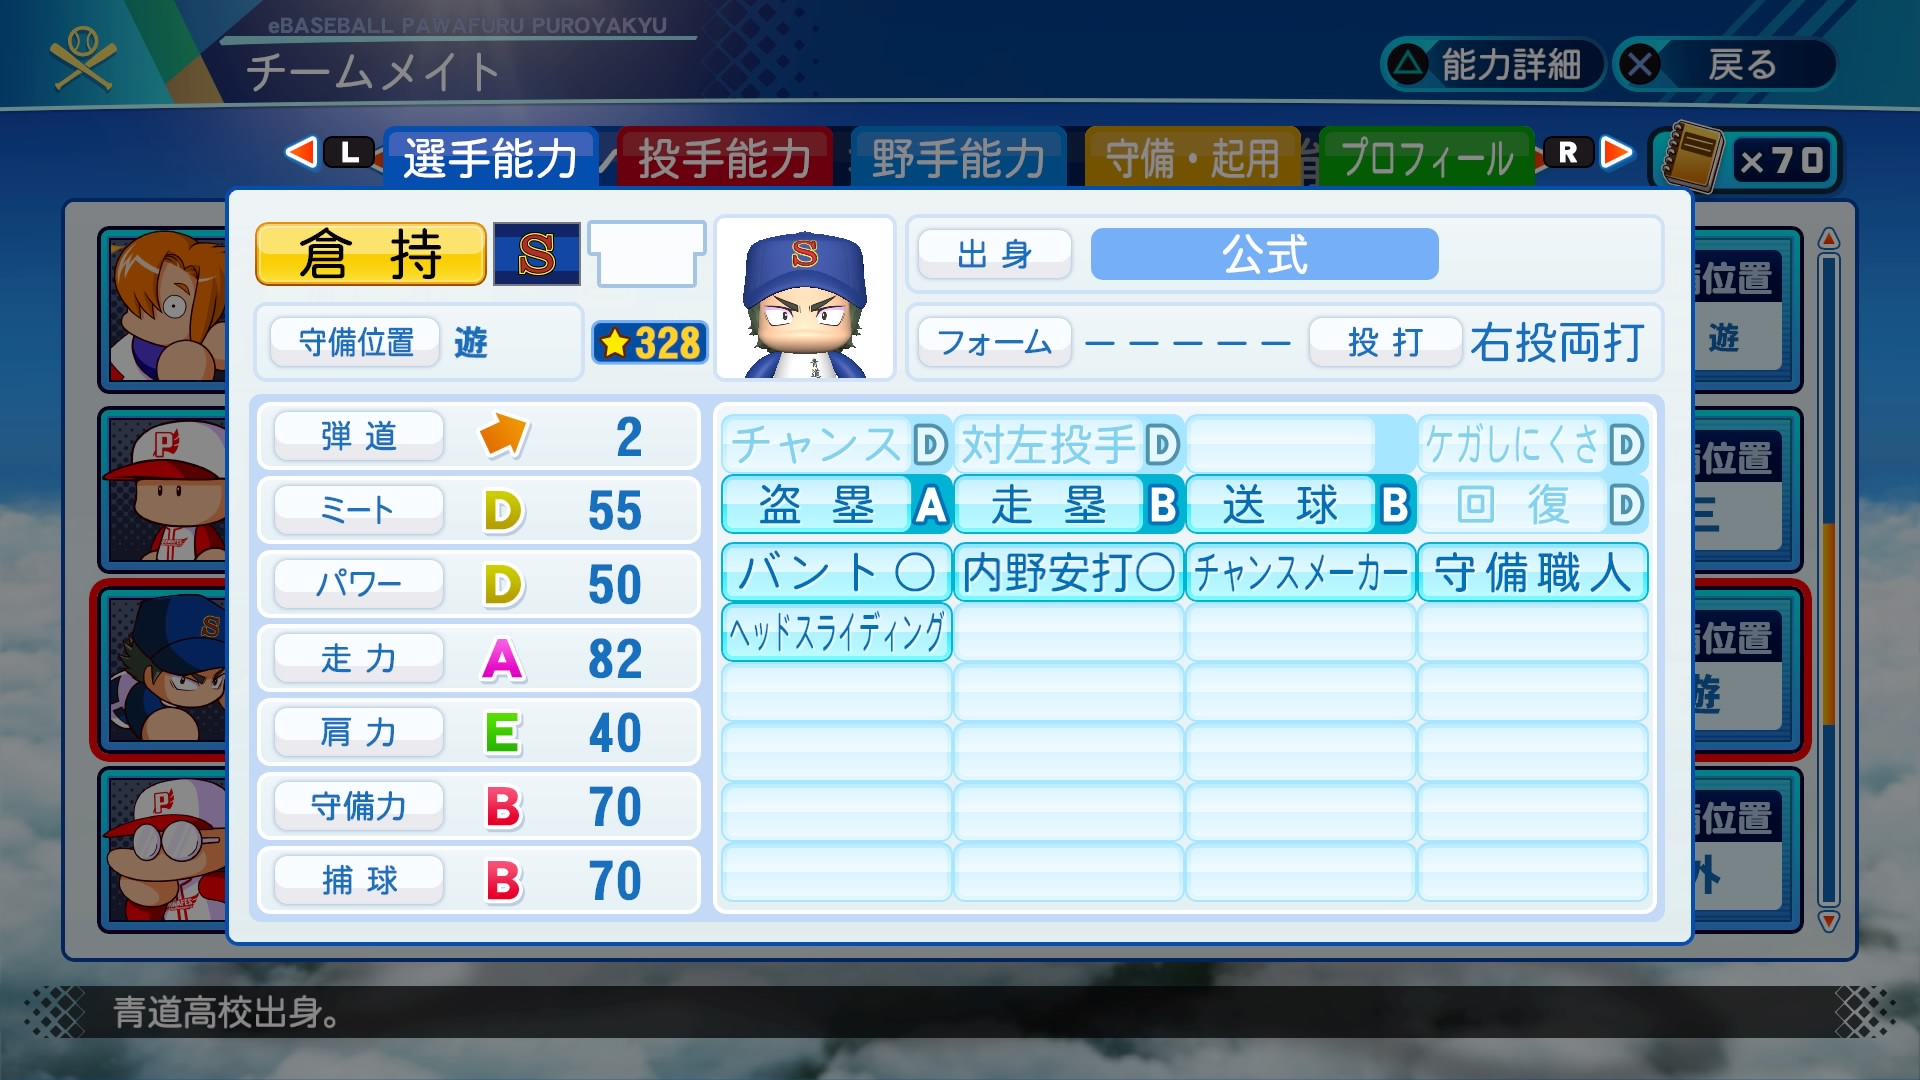 E8_KXigUUAUsI2W.jpg